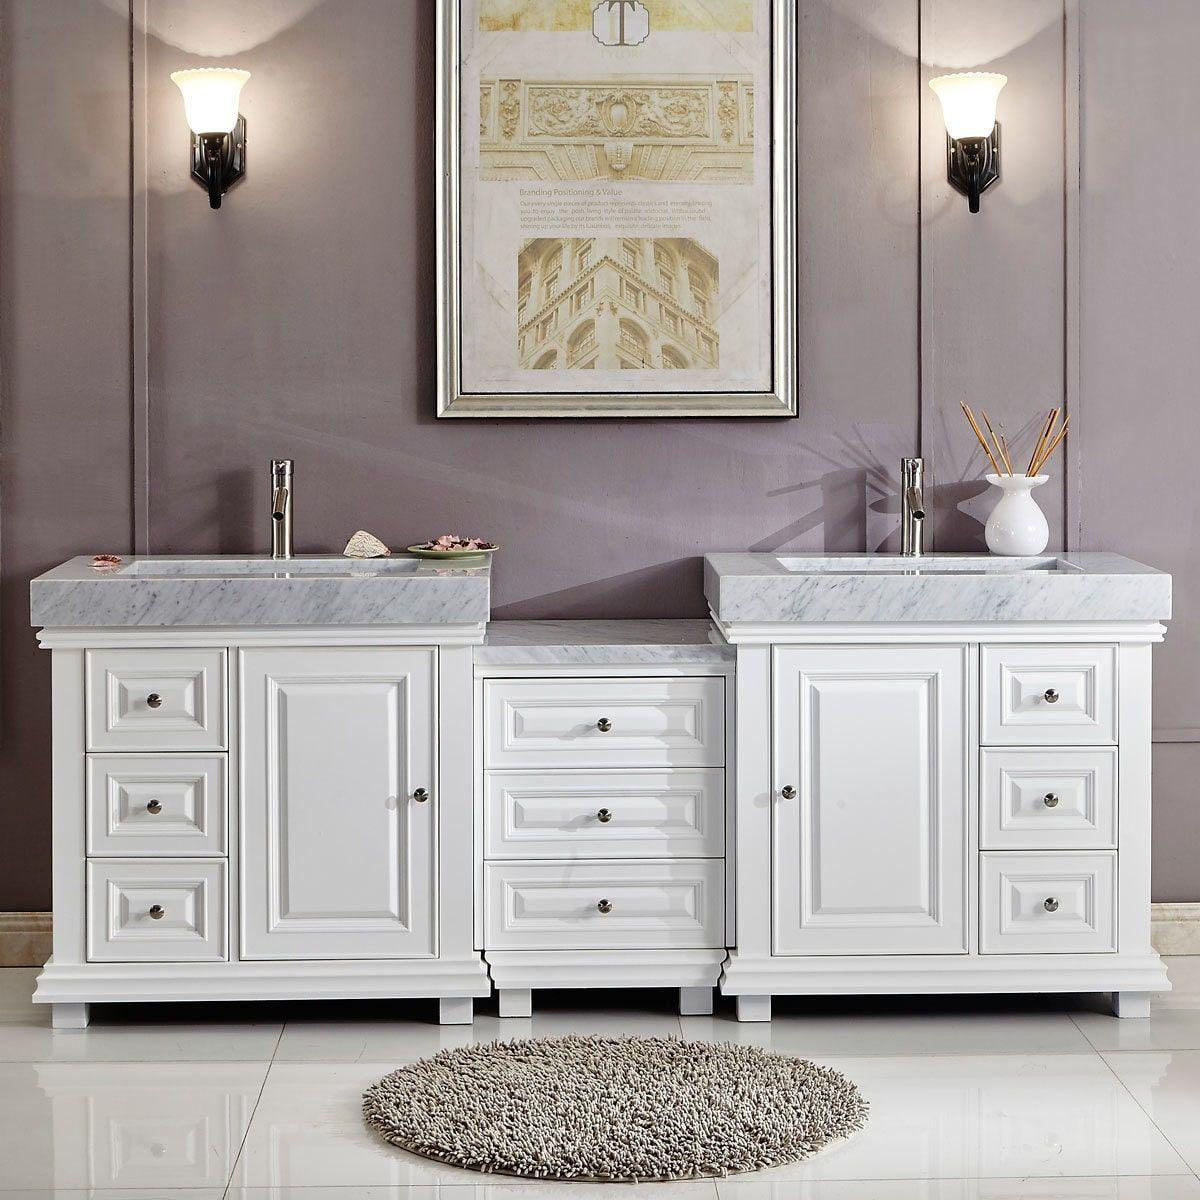 Silkroad exclusive modern bathroom vanity double sink cabinet w